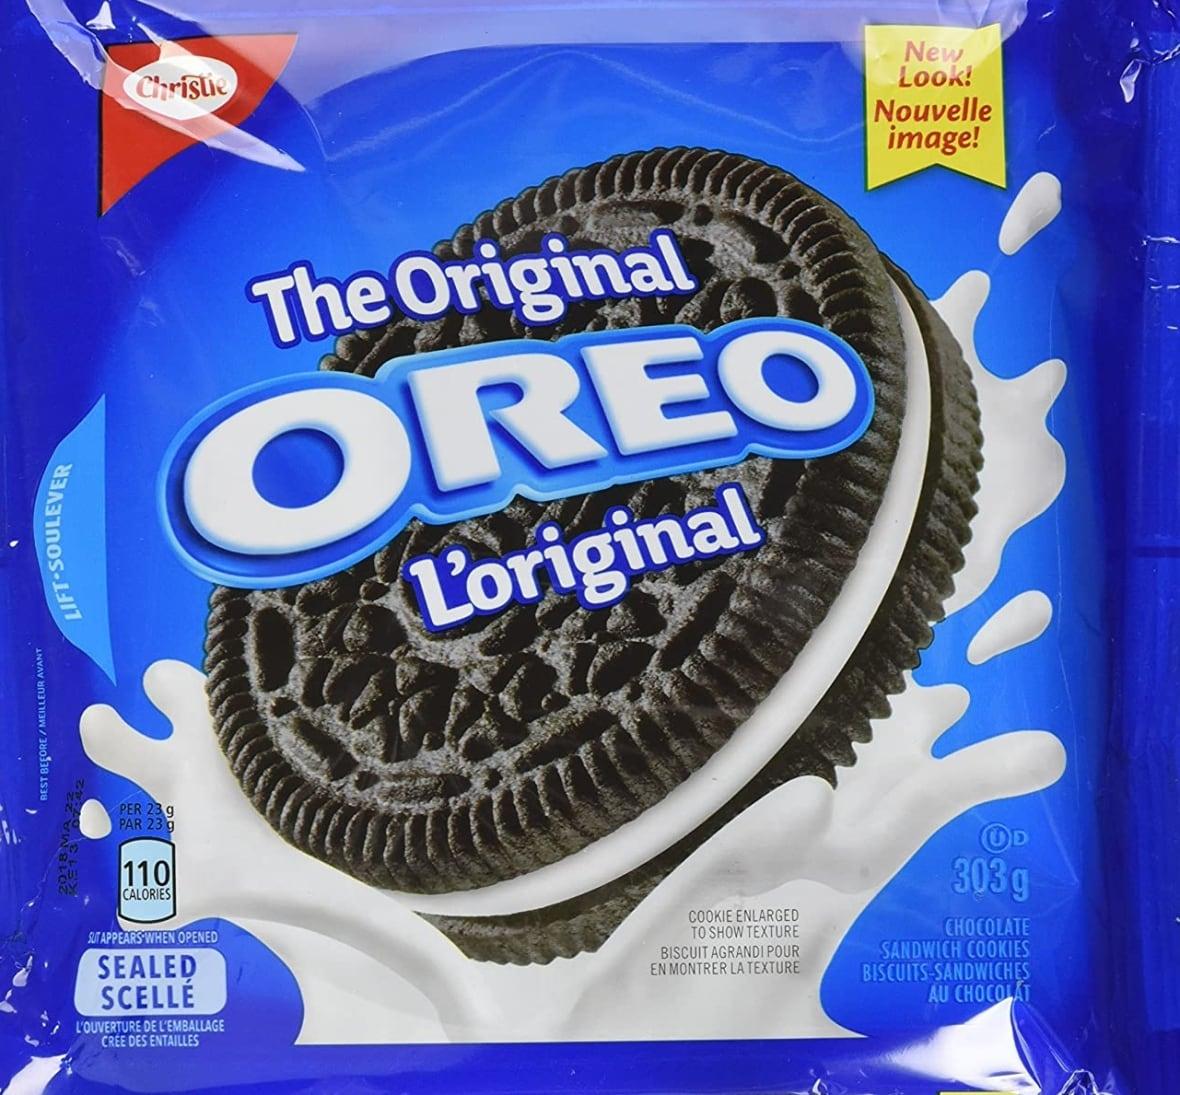 https://i.cbc.ca/1.6021055.1620677987!/fileImage/httpImage/image.jpg_gen/derivatives/original_1180/oreo-cookies.jpg